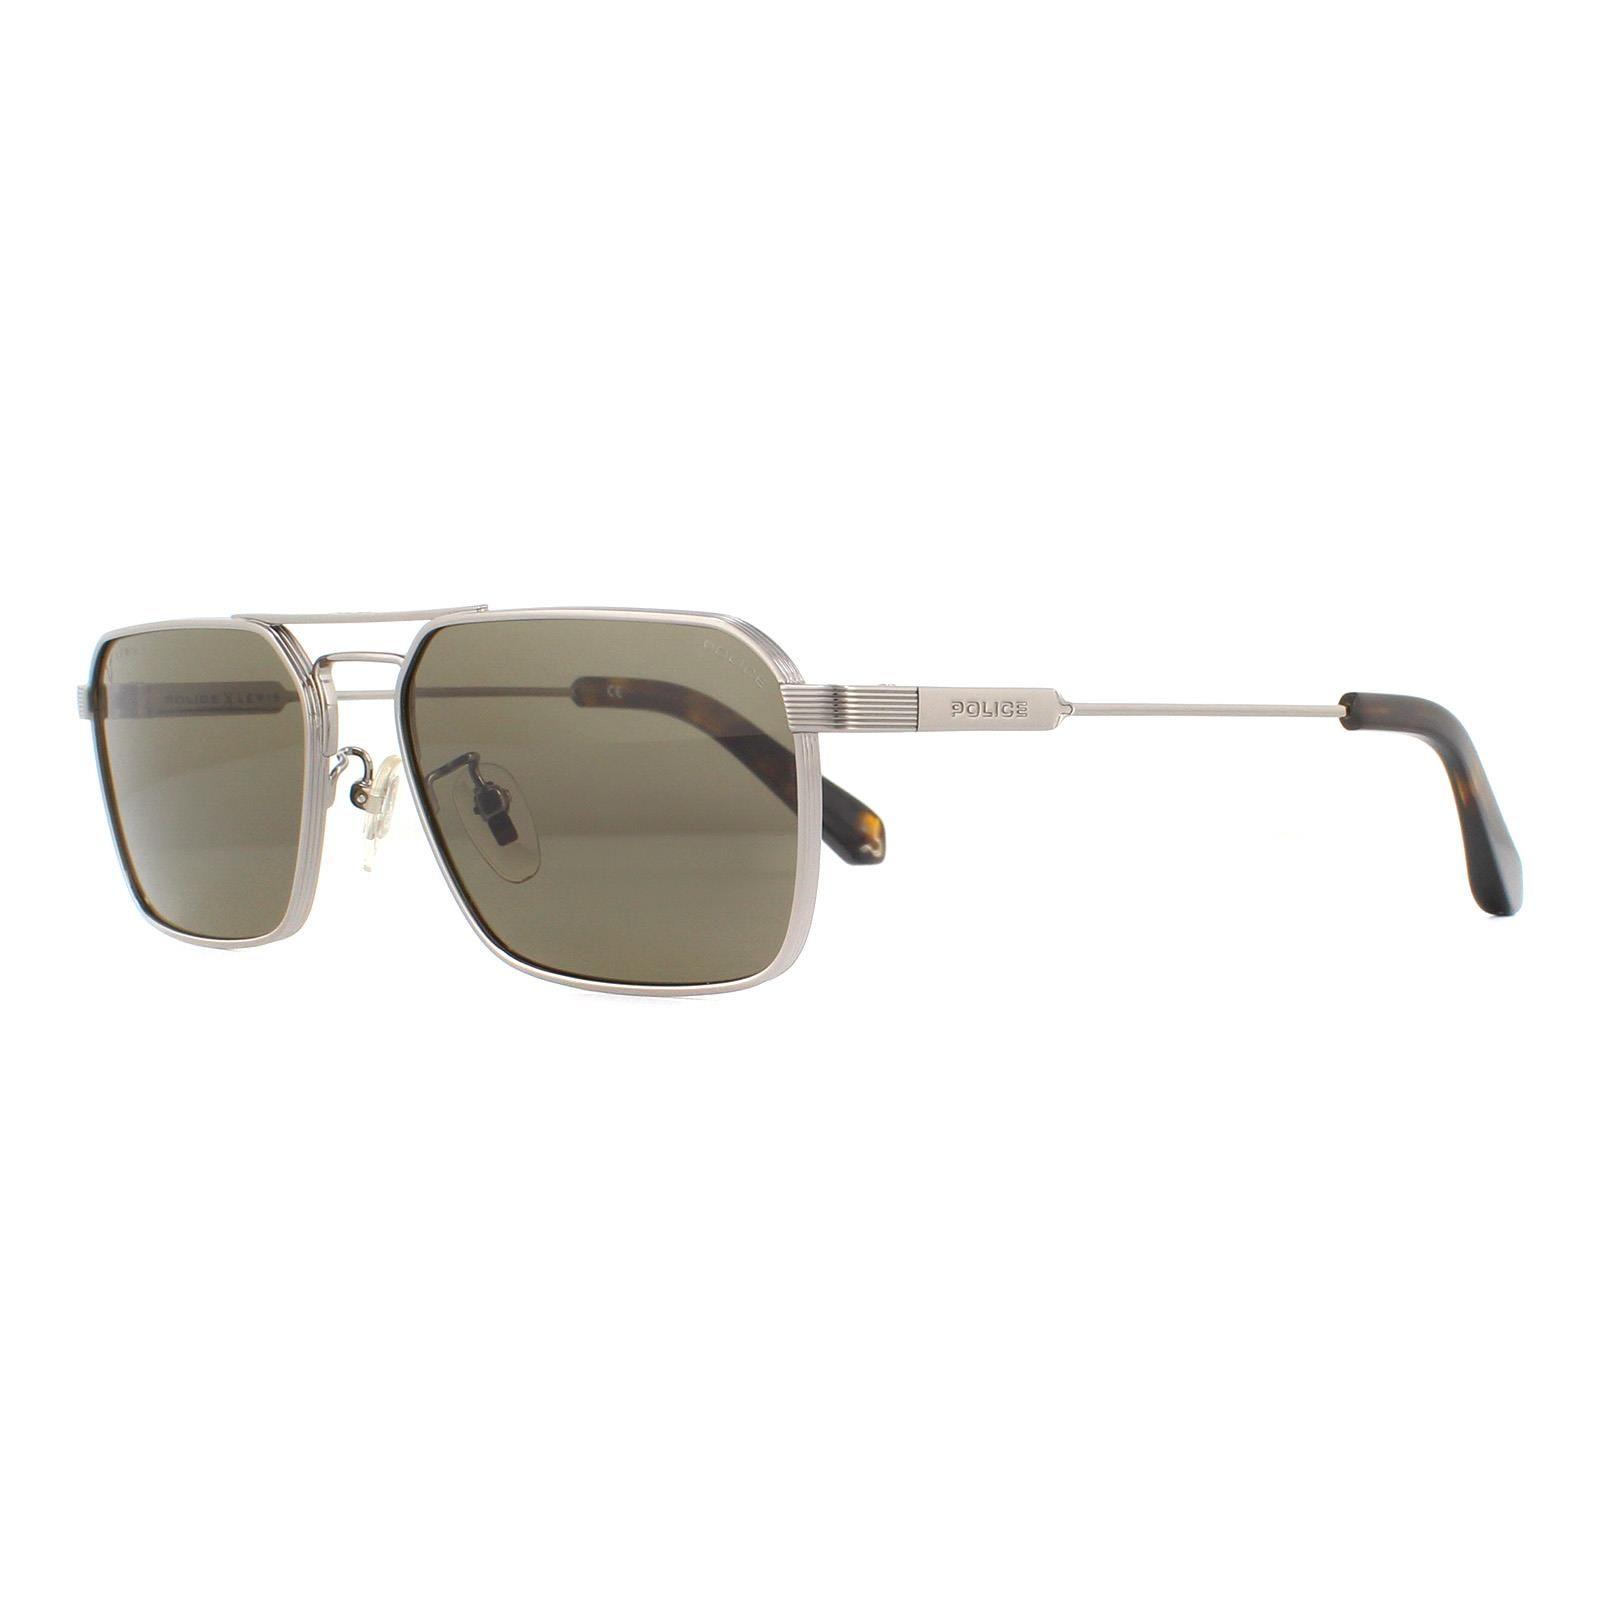 Police Sunglasses SPLA23 Lewis Hamilton 0509 Shiny Ruthenium Brown